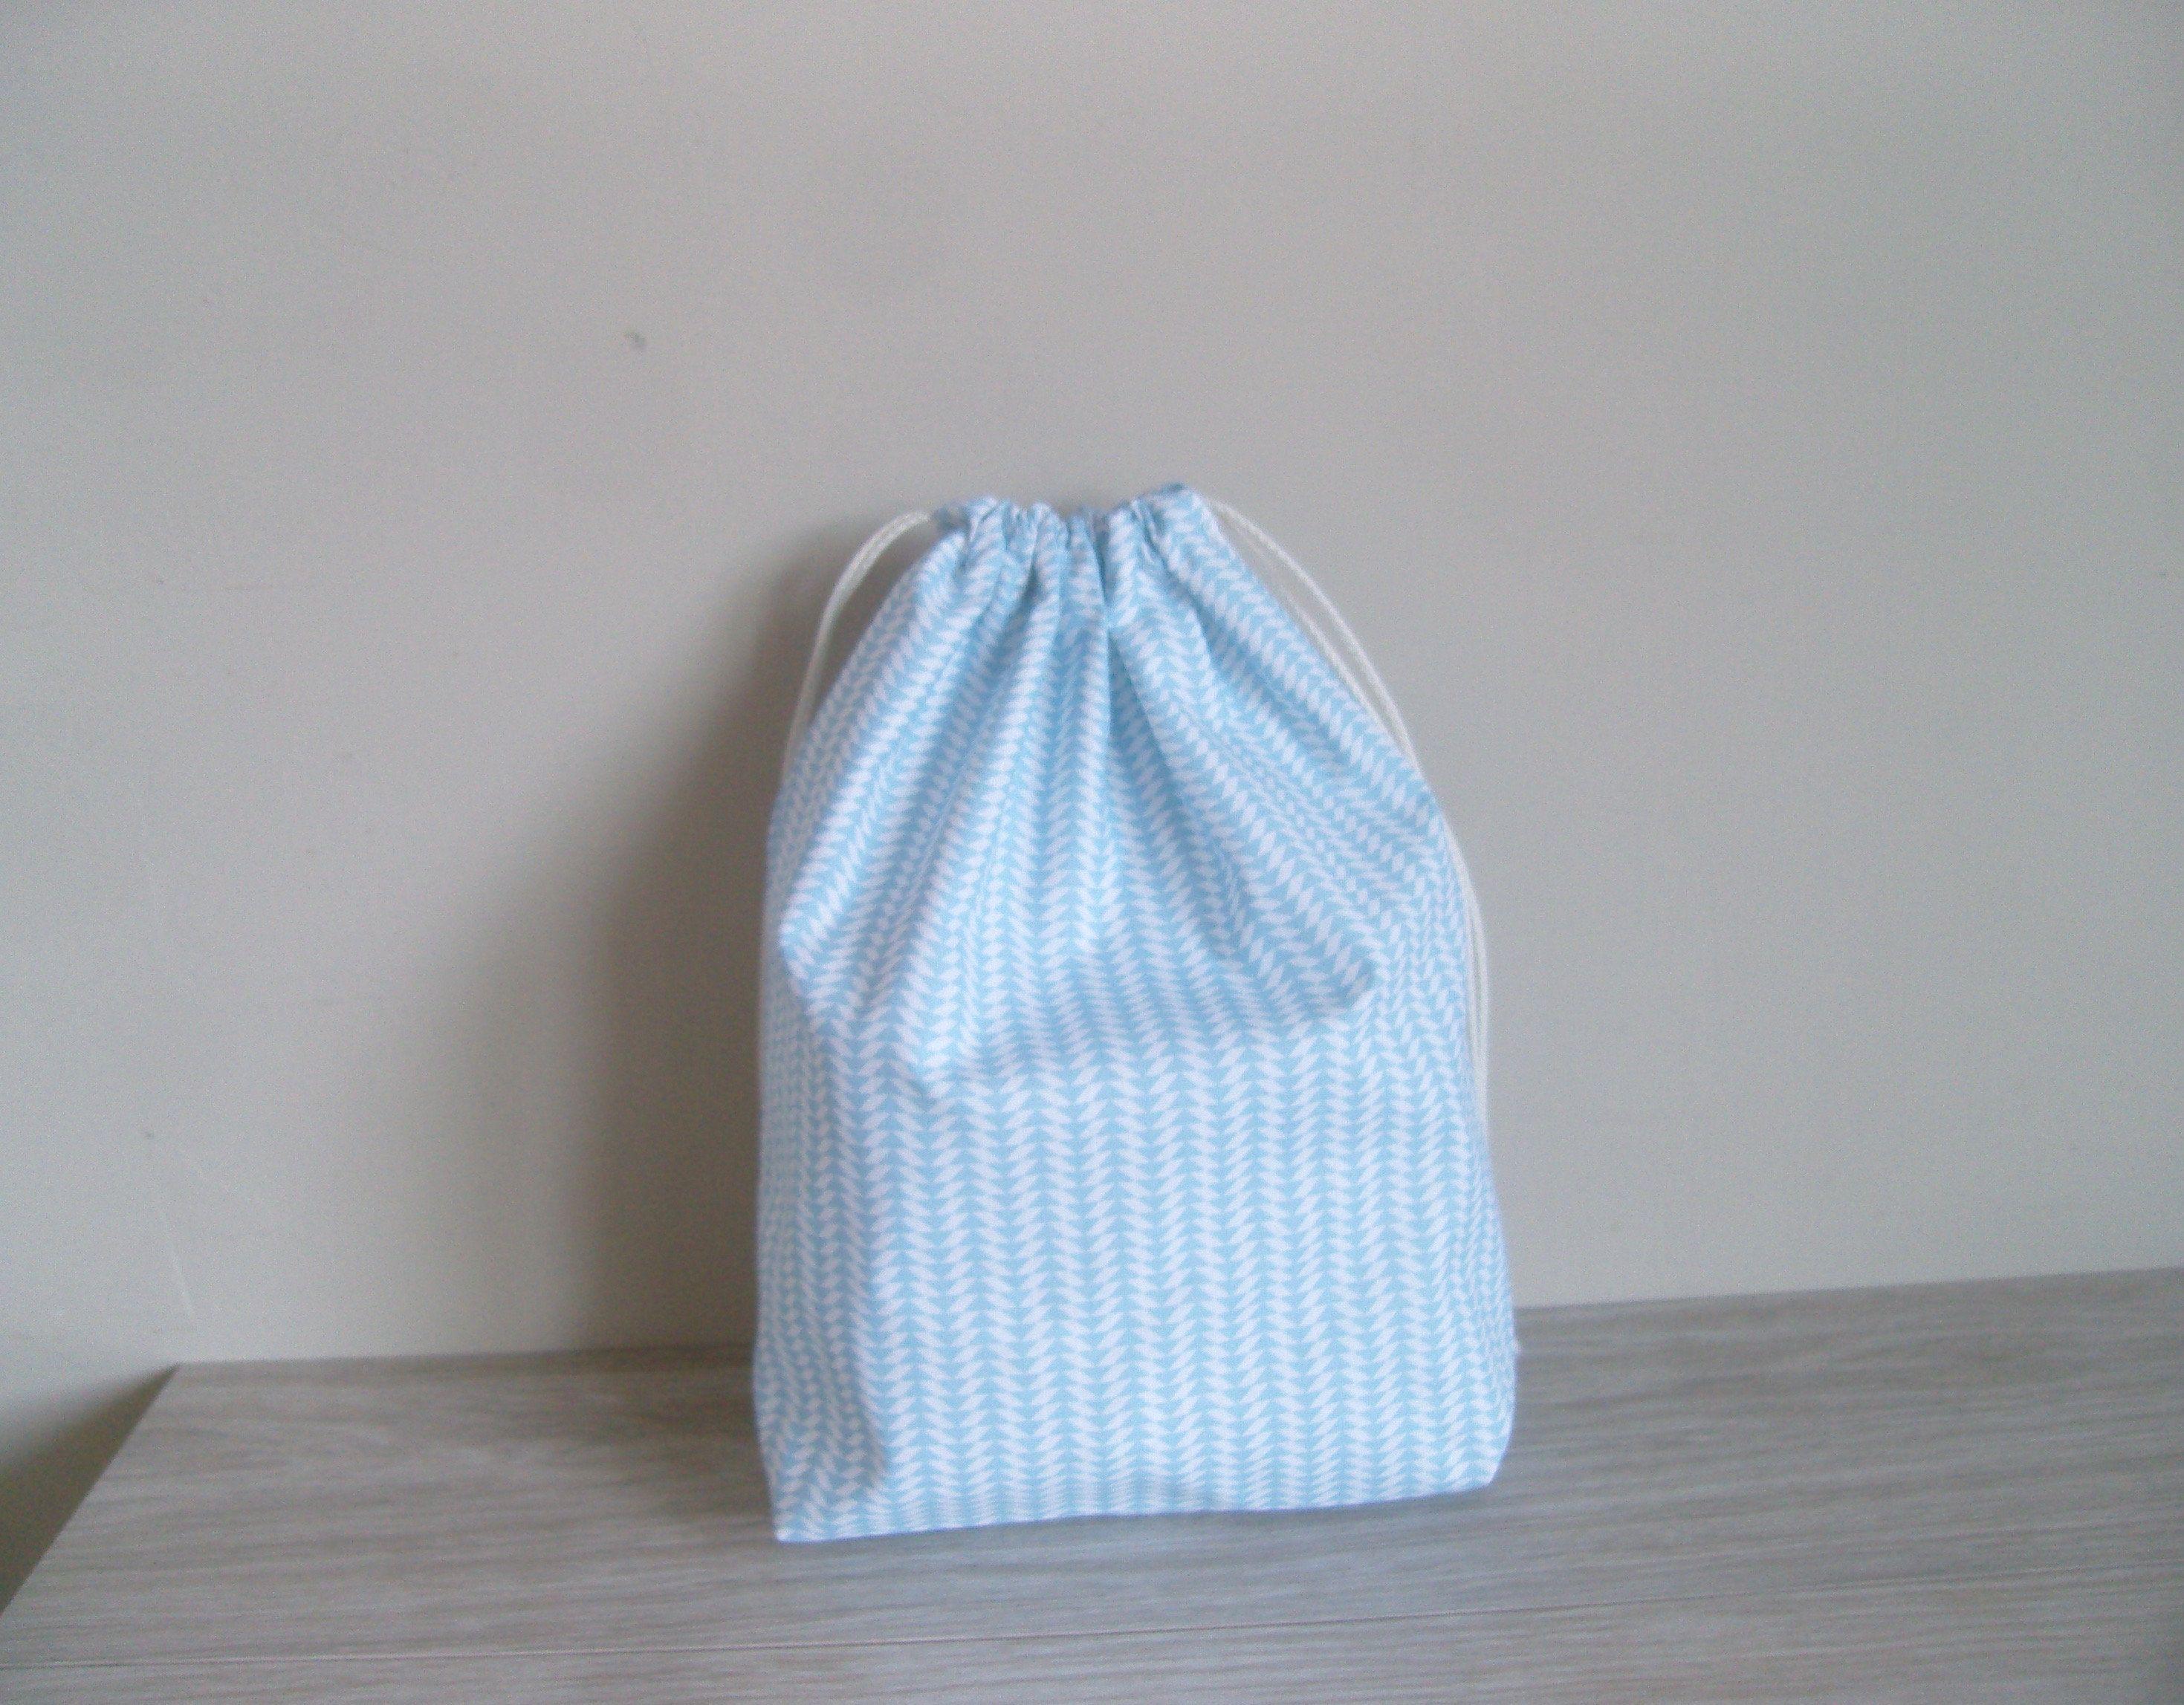 Pouch, gift wrapping, reusable, eco-friendly, zero waste cotton oekotex Scandinavian pattern, blue triangles. #emballagecadeauecologique